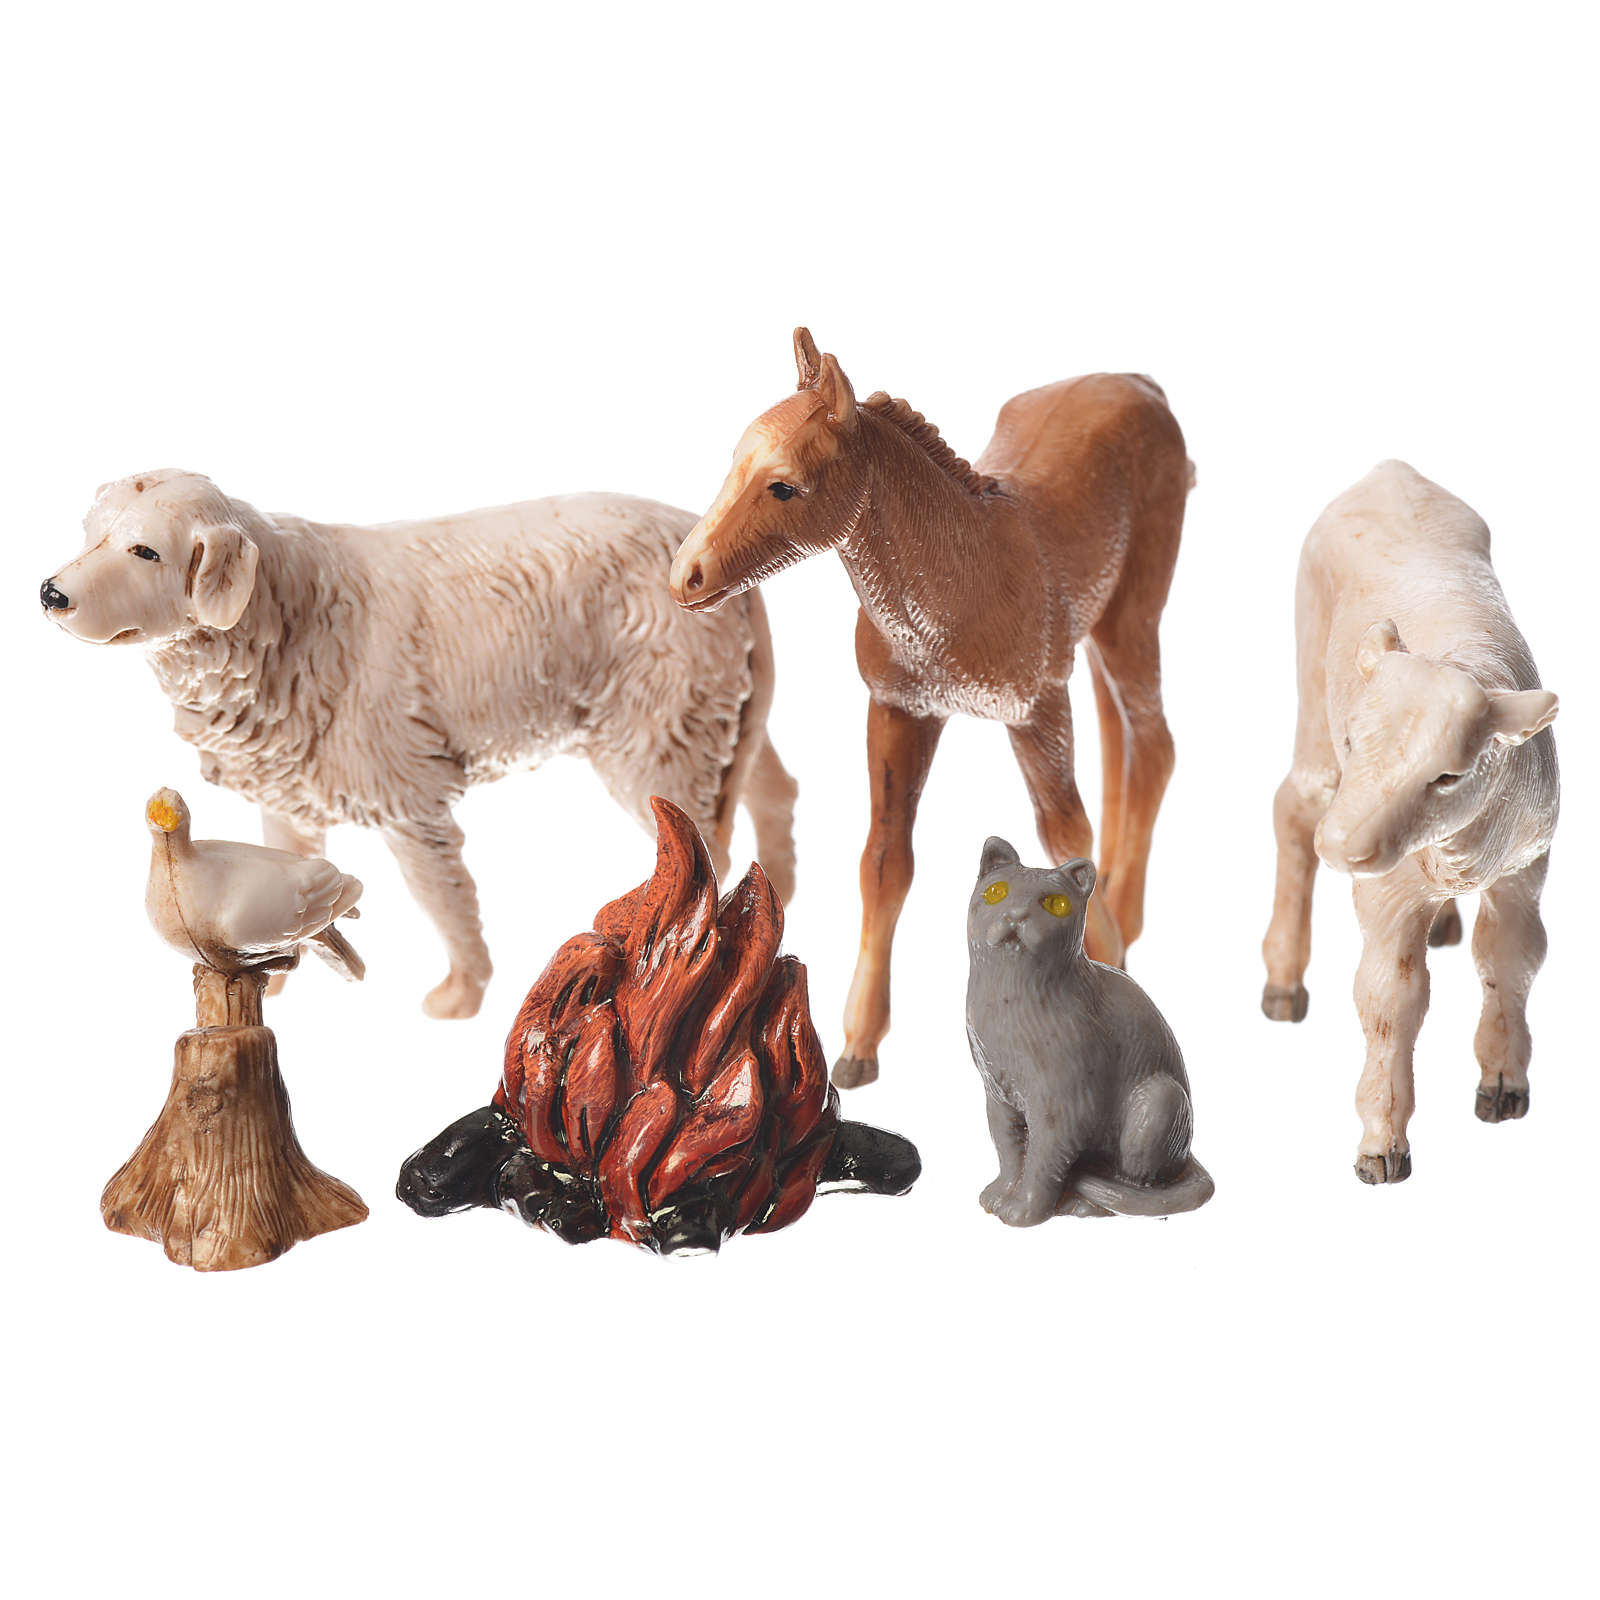 Nativity Scene animals and wood fire by Moranduzzo 10cm, 5 pieces 4